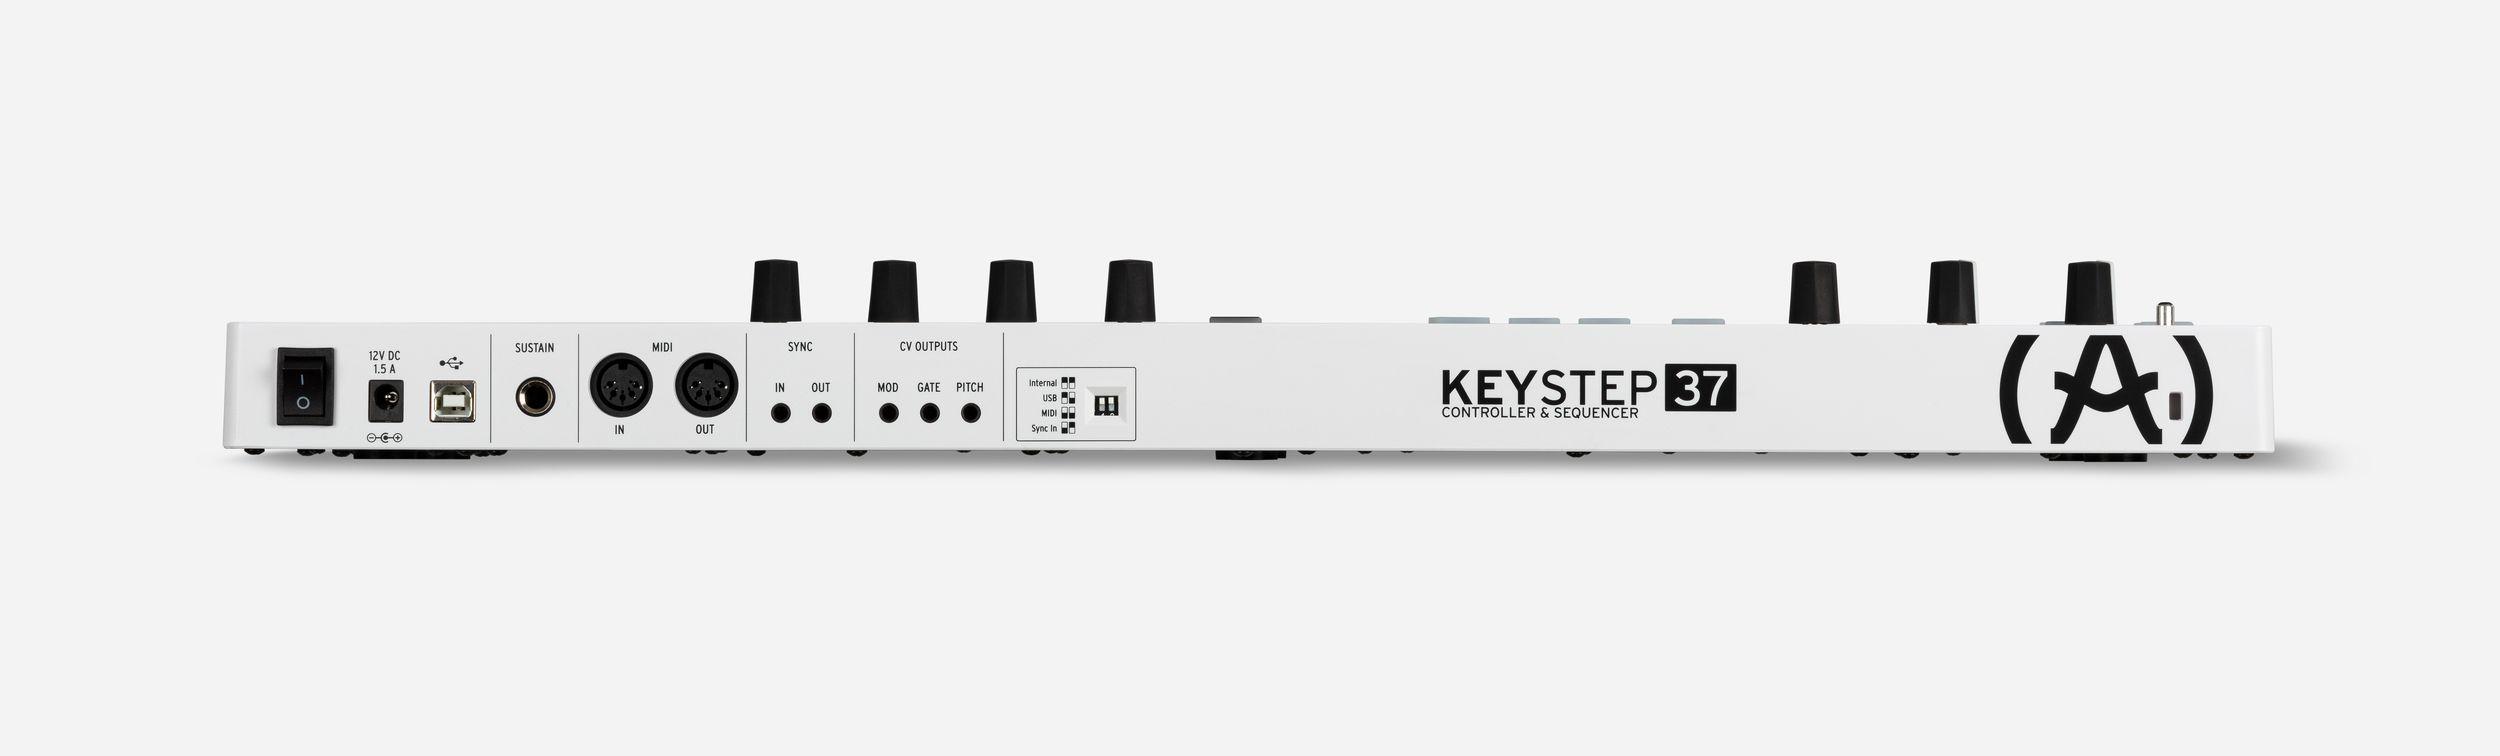 ARTURIA KEYSTEP-37 USB CONTR.